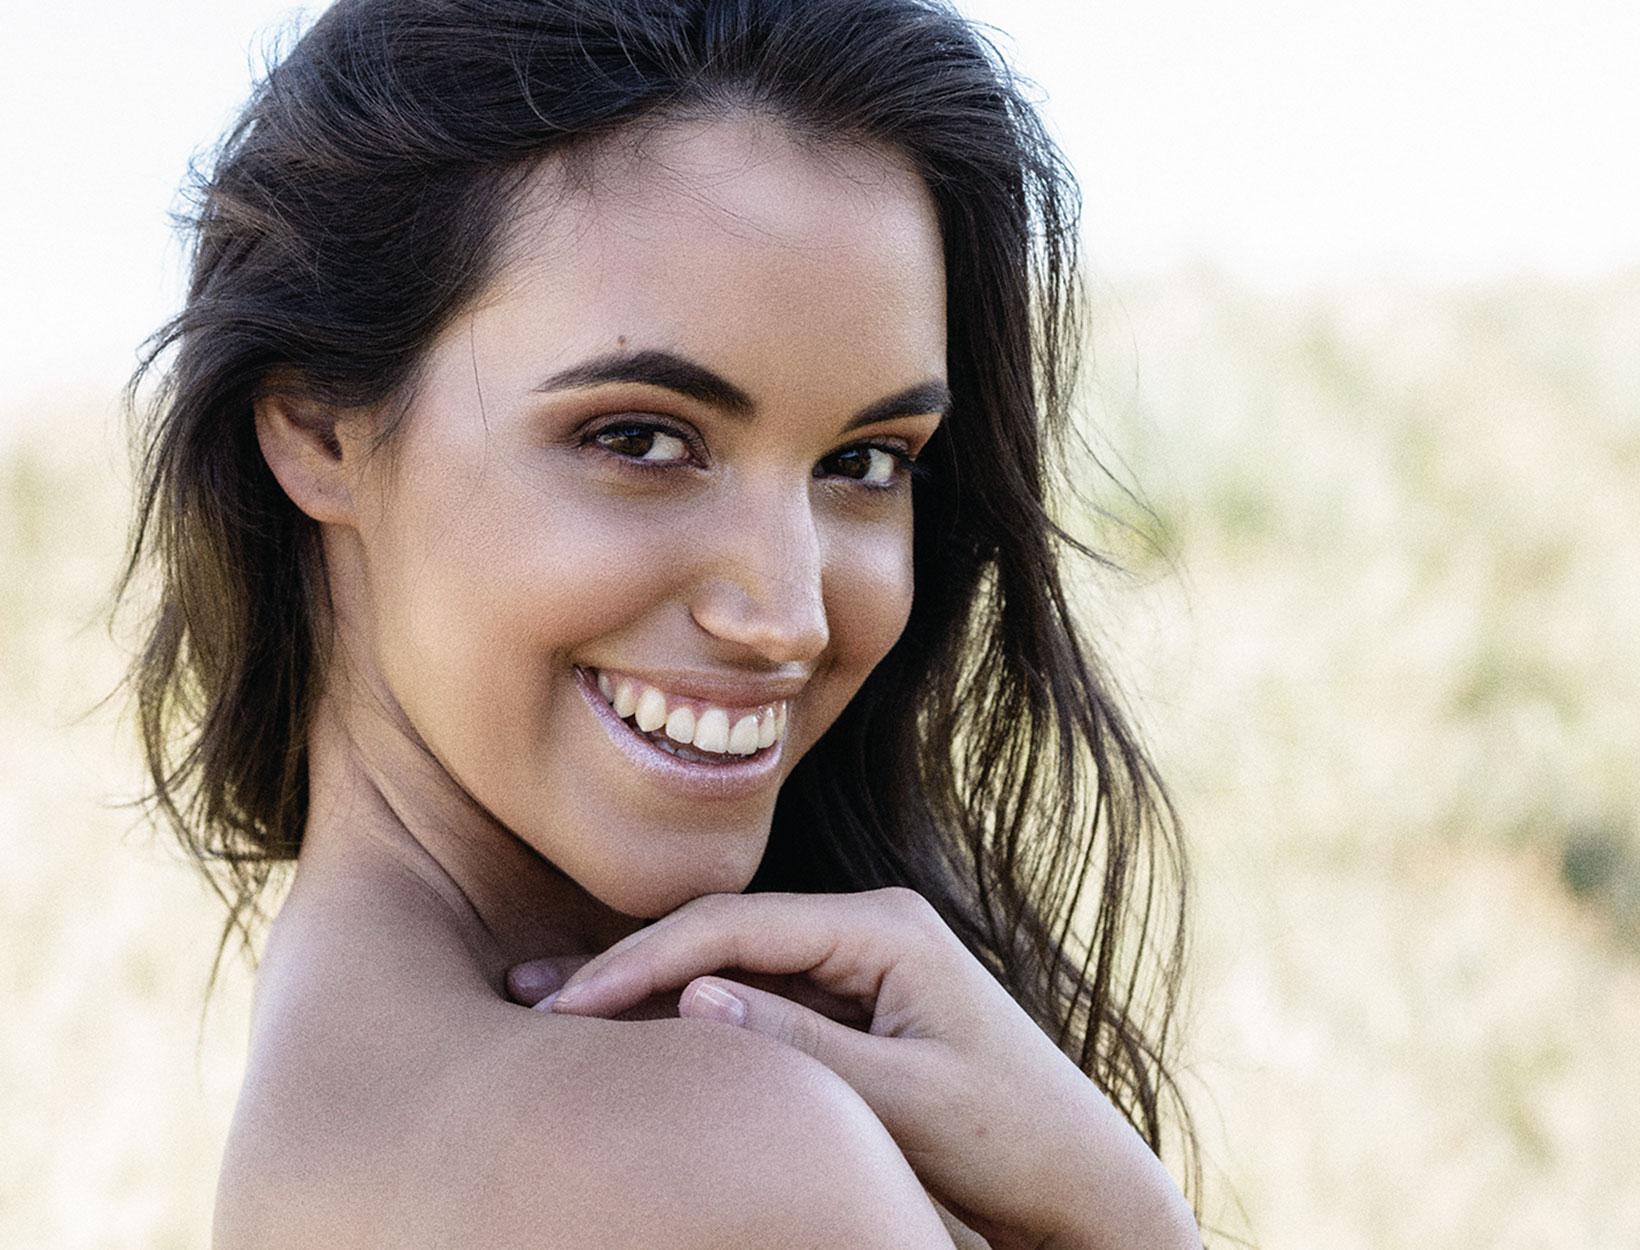 woman with nice skin